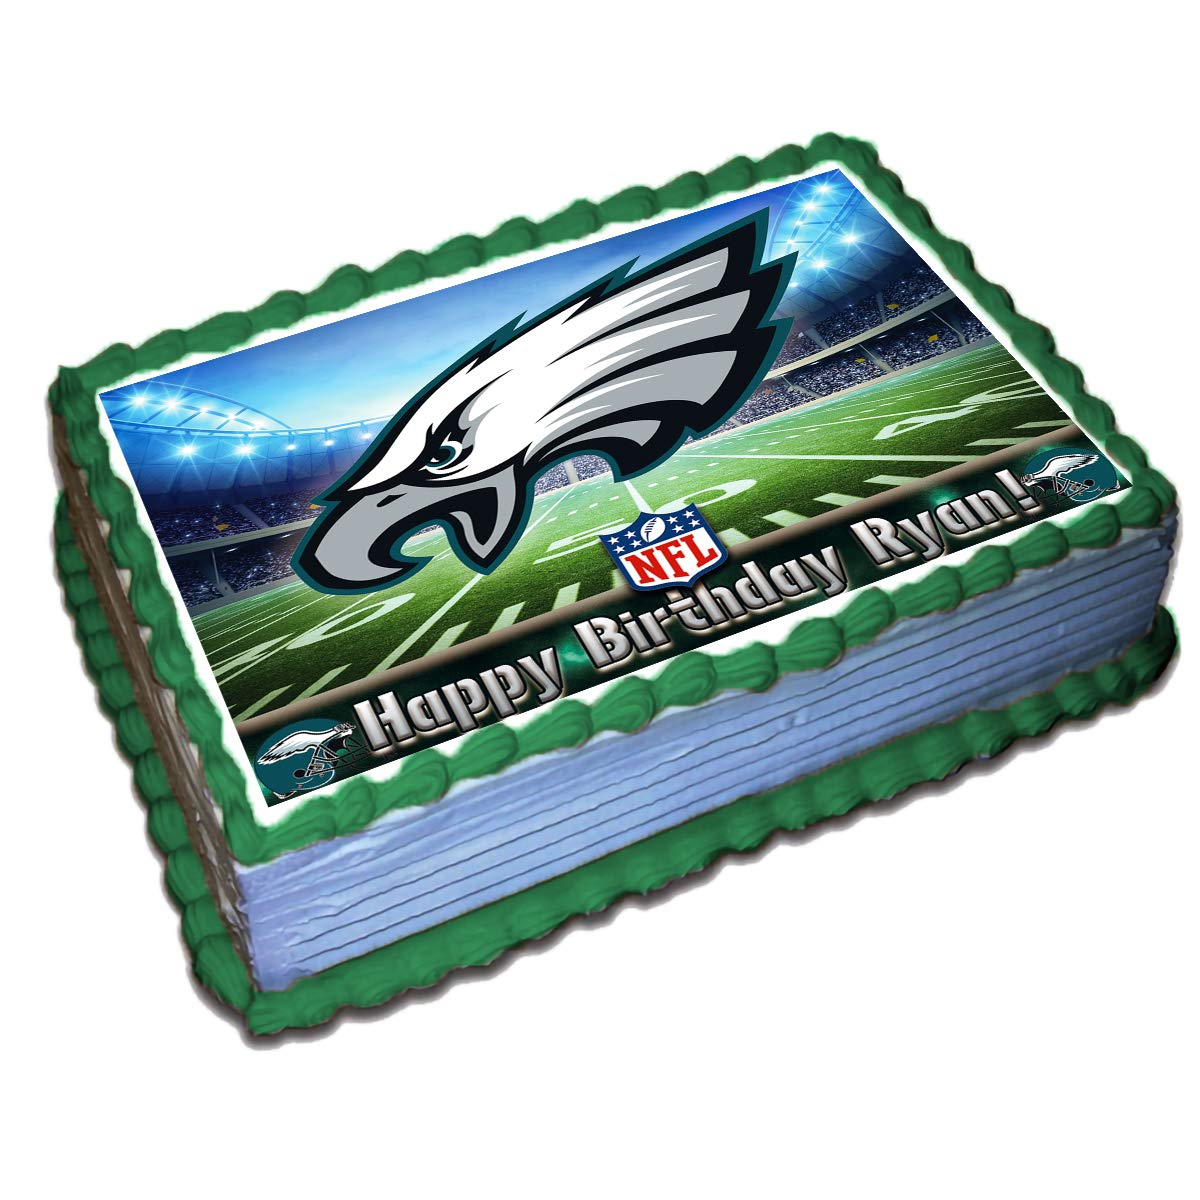 Marvelous Philadelphia Eagles Nfl Personalized Cake Topper Icing Sugar Paper Personalised Birthday Cards Veneteletsinfo